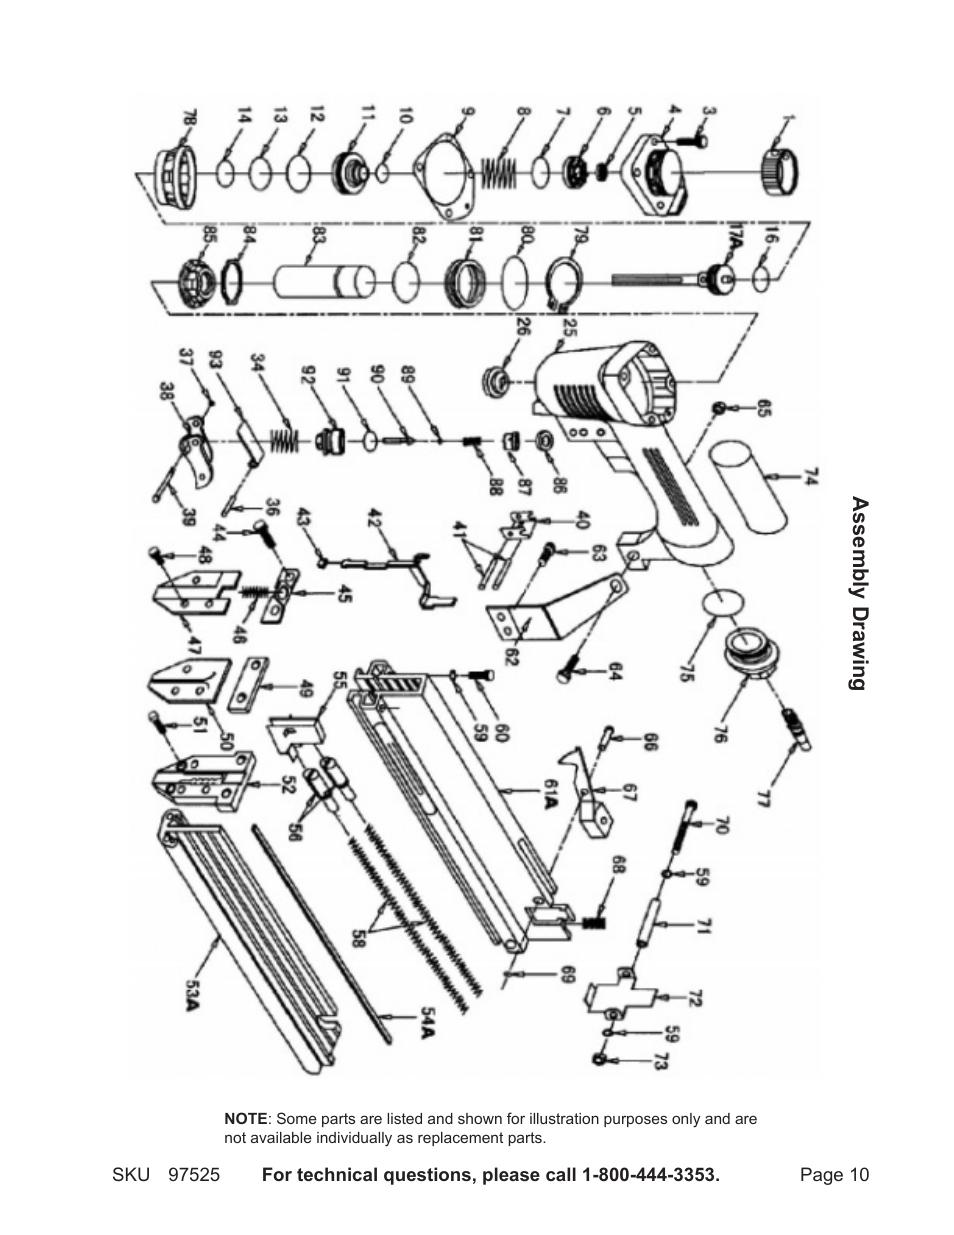 Harbor Freight Tools Central Pneumatic AIr Nailer/Stapler